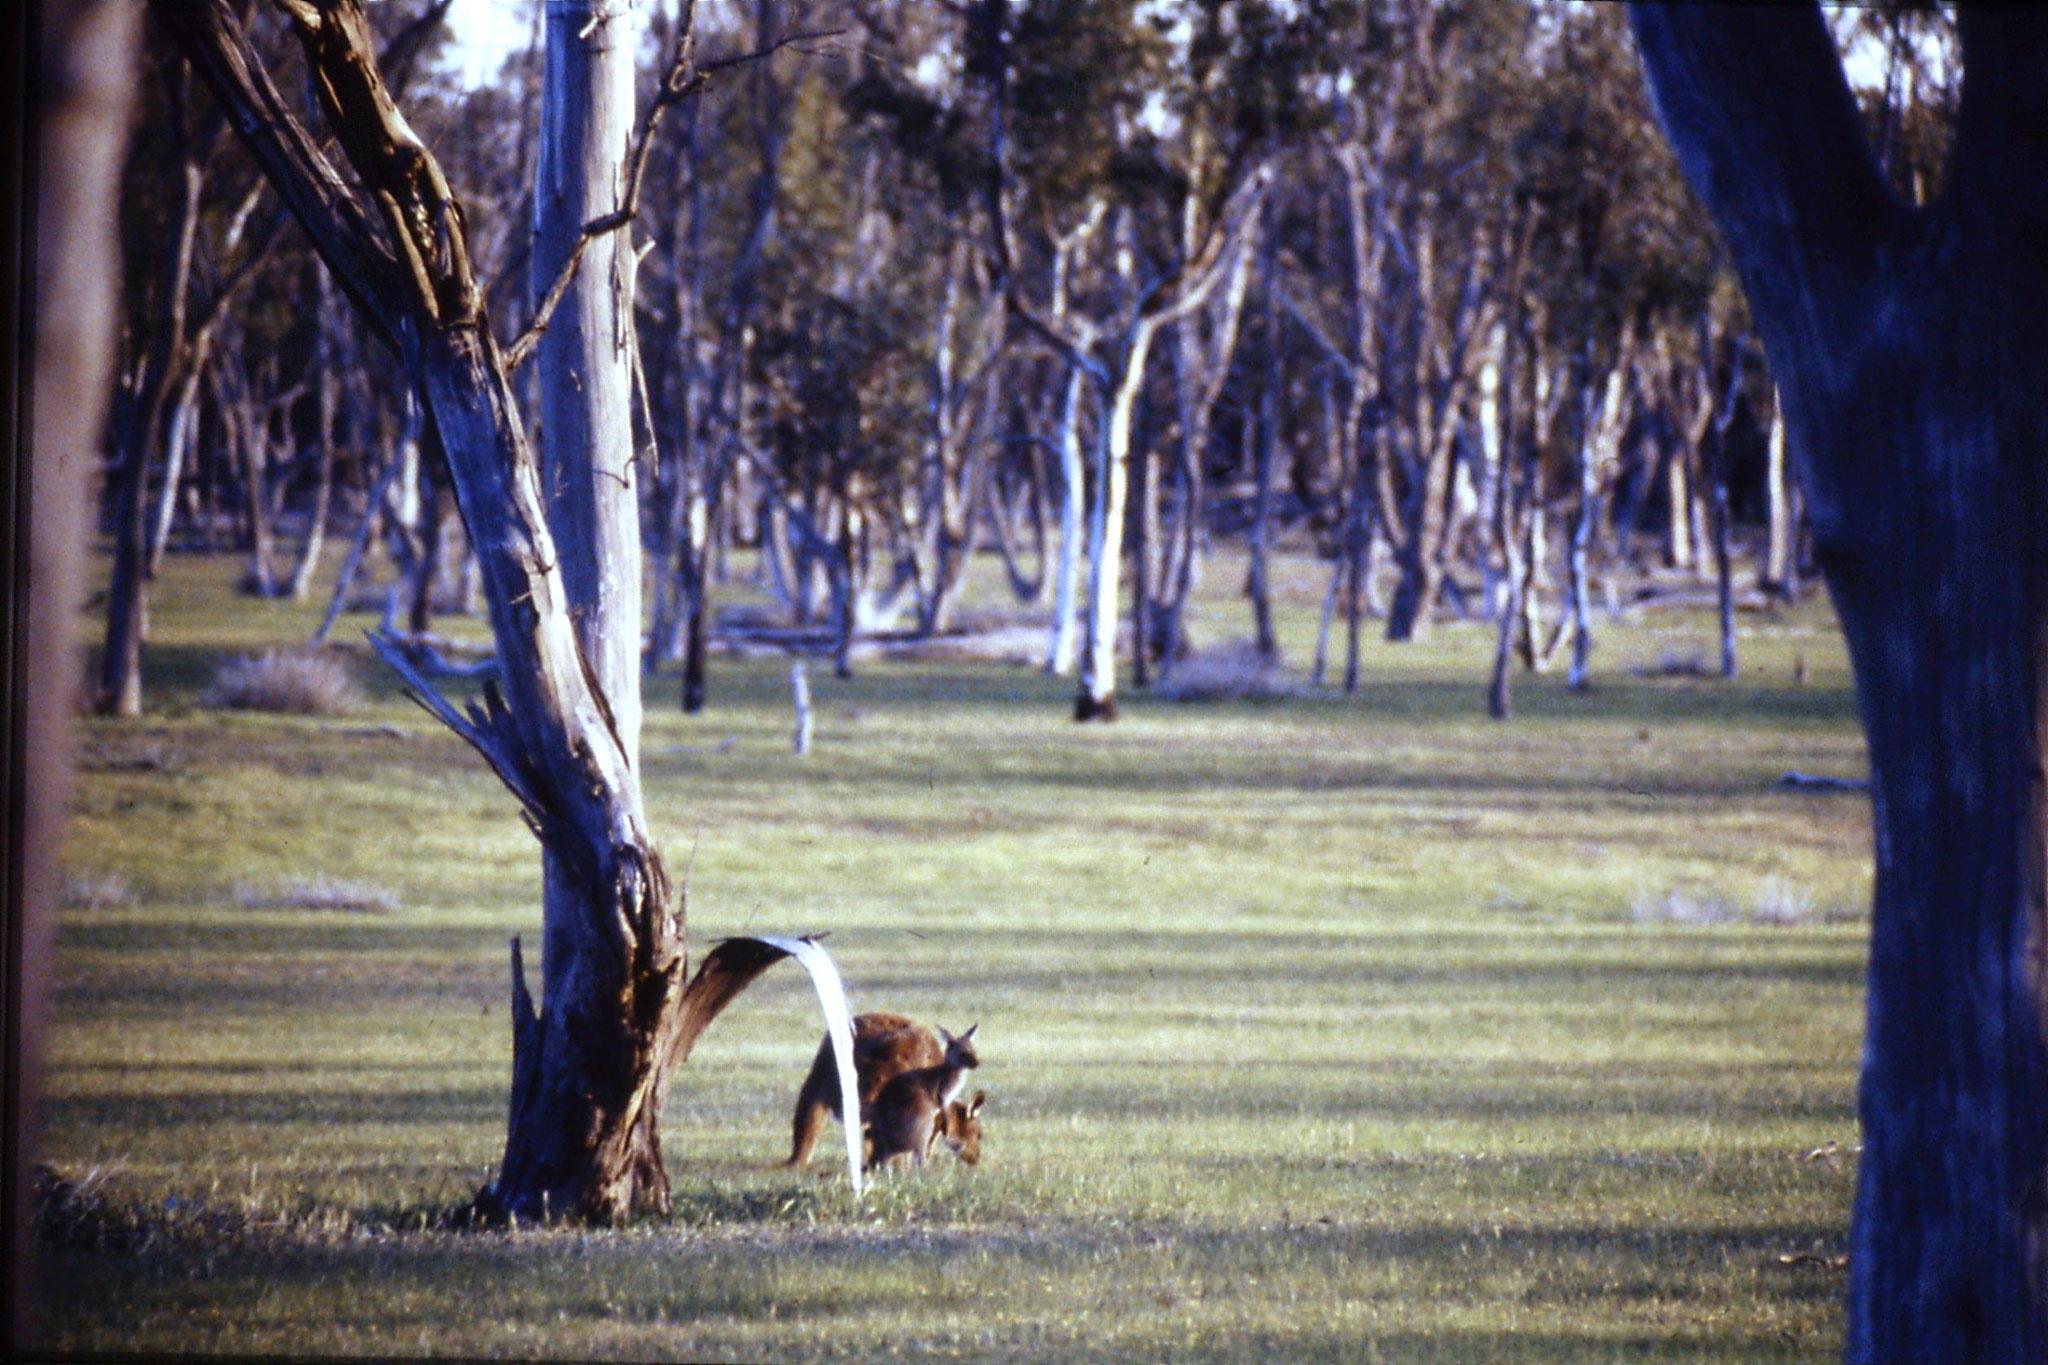 23/9/1990: 5: Western grey kangaroos